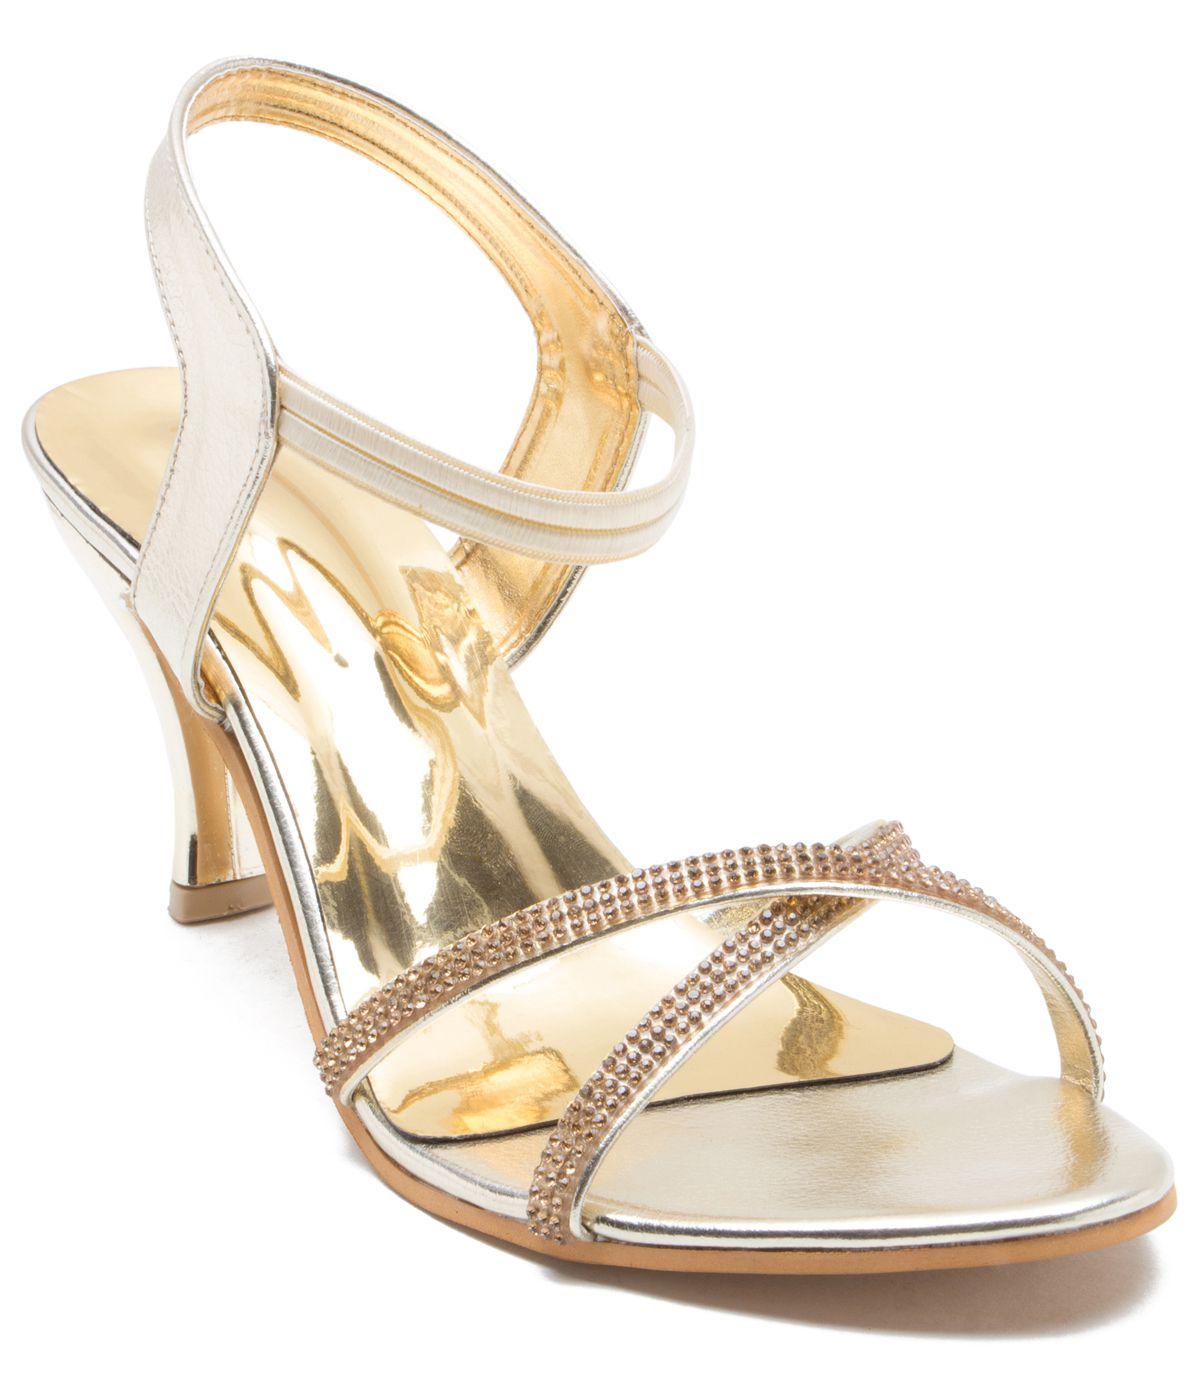 ZAIRA & SAIRA Gold Kitten Heels